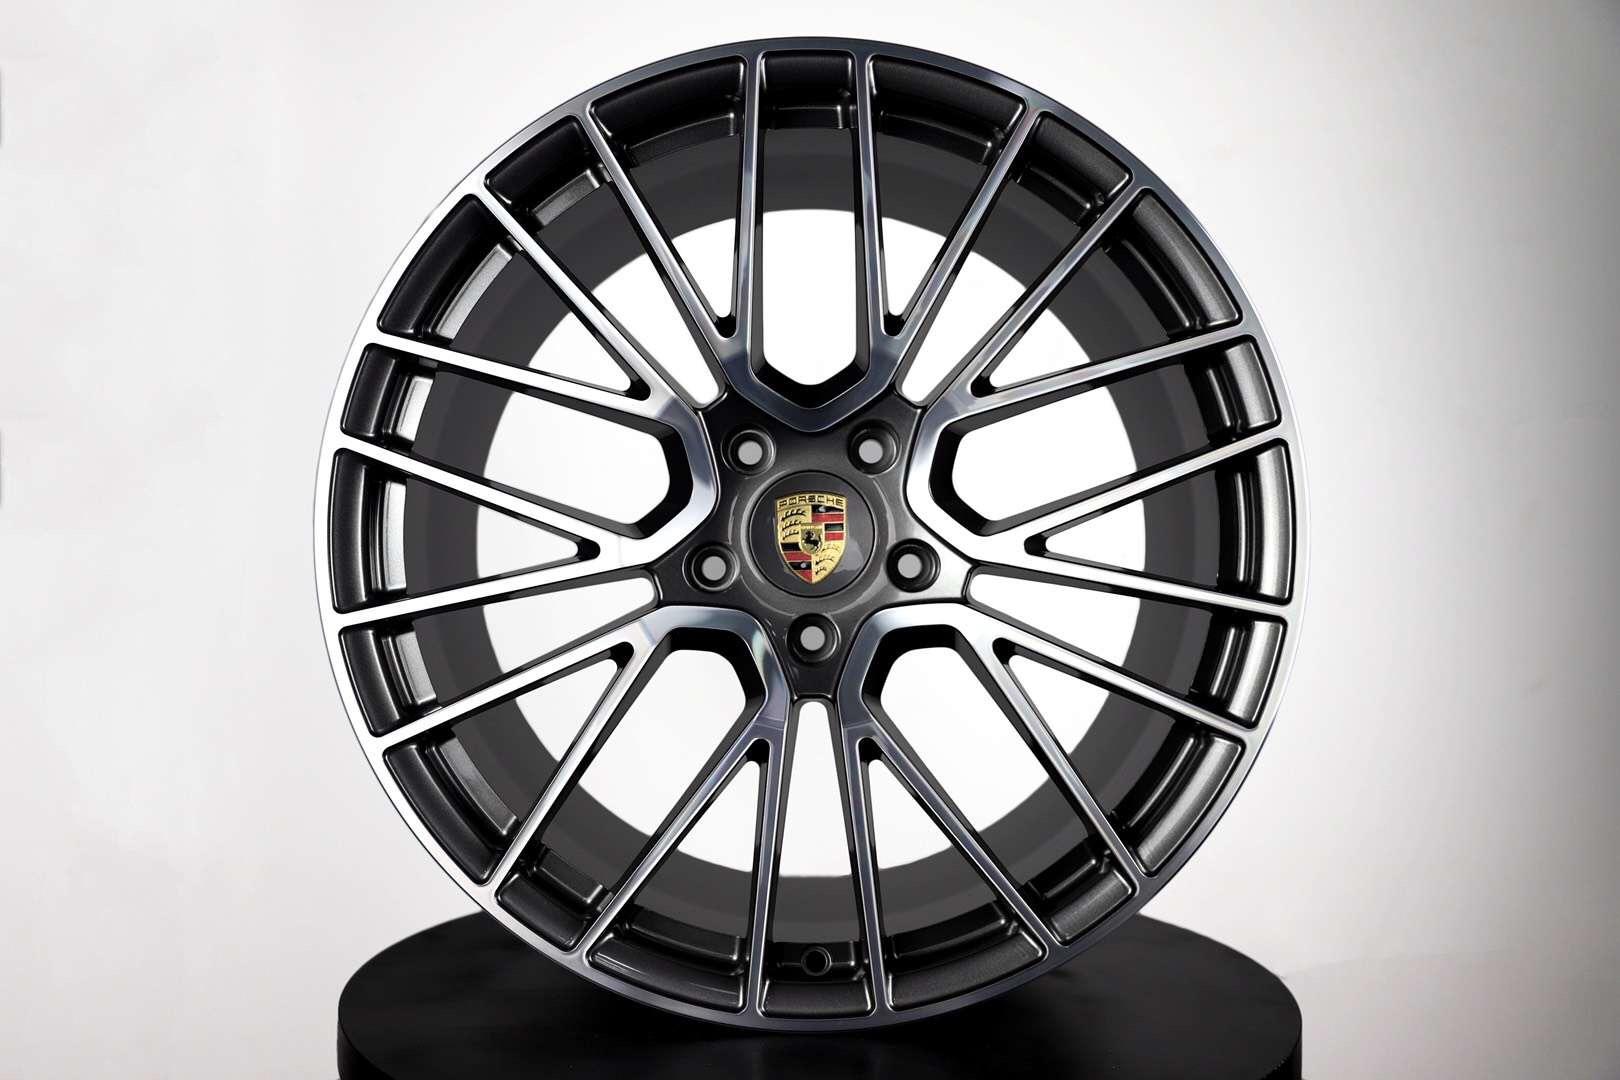 Porsche forge rims cayman/boxster/carrera4/4s/911/991/cayenne/Macan/panamera